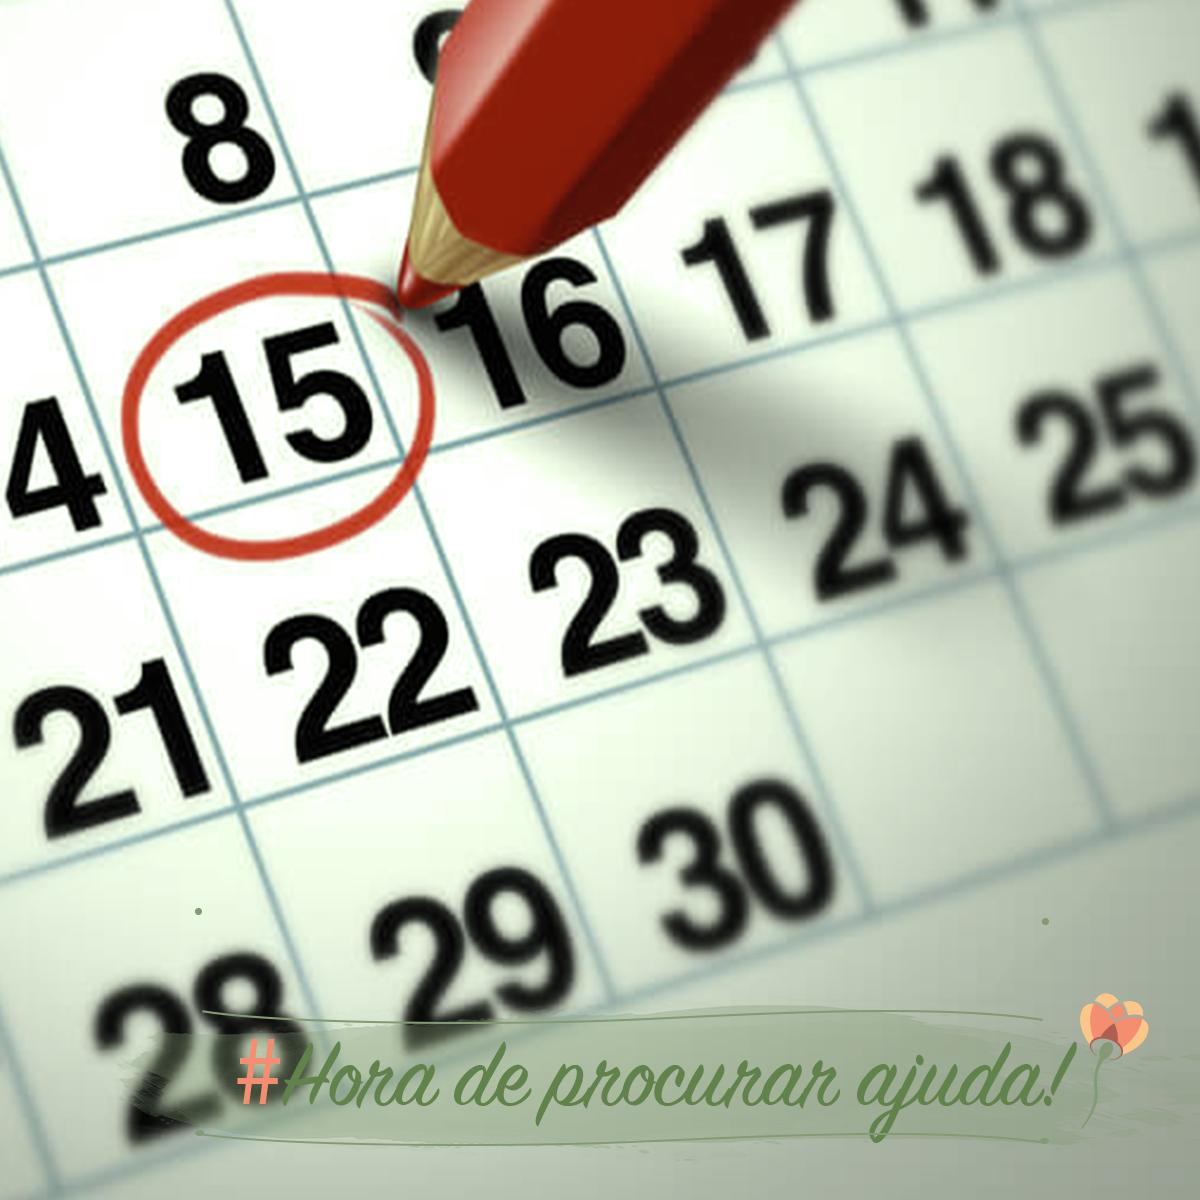 fertivitro_midias-sociais-17-18_procurar-ajuda-17_layout-01